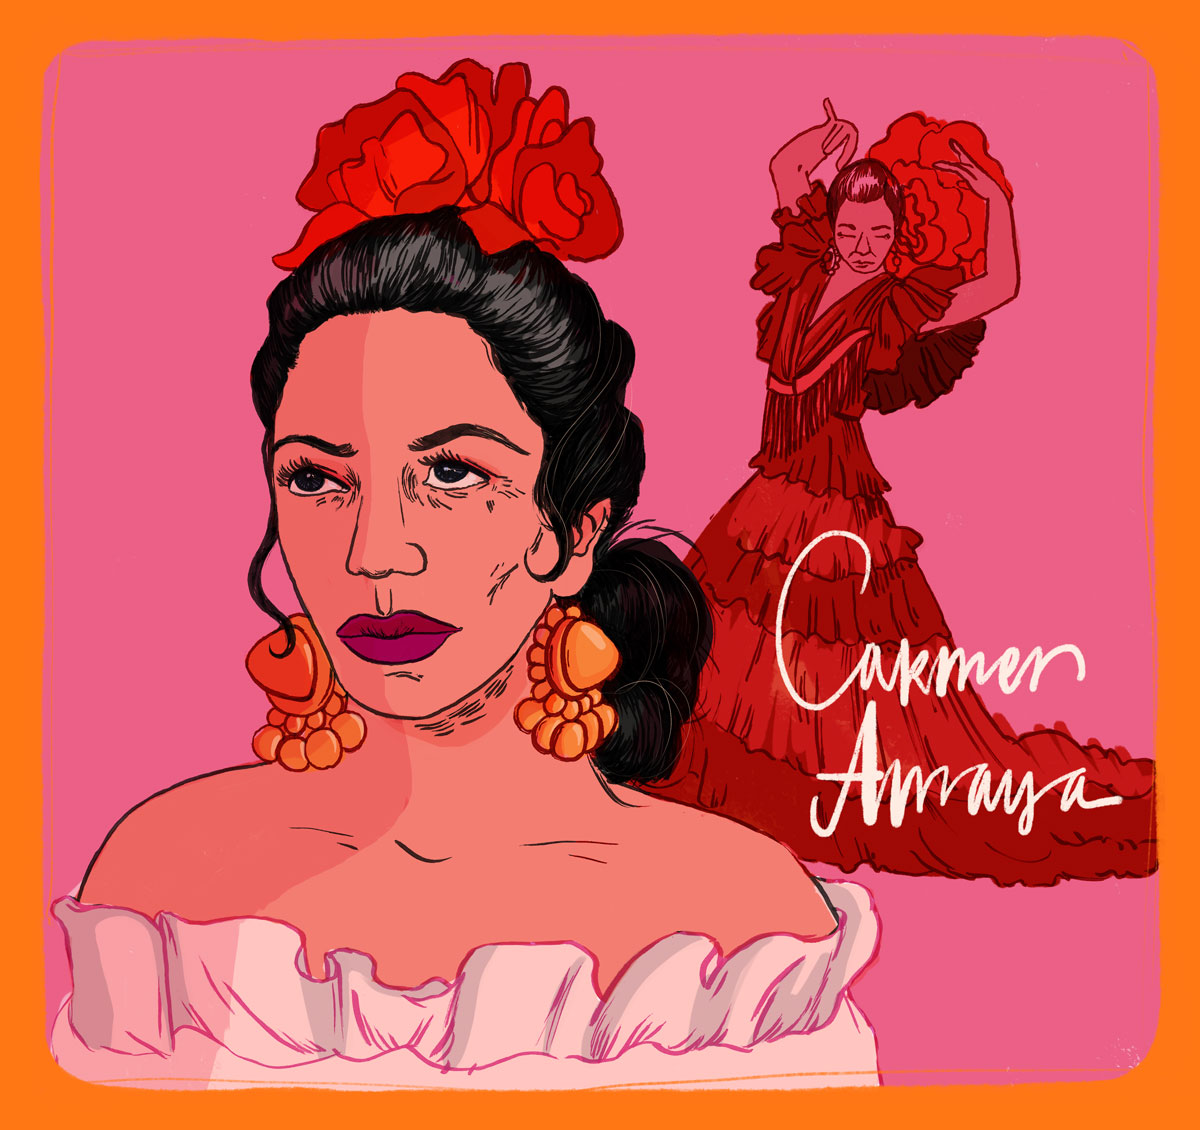 Carmen_Amaya